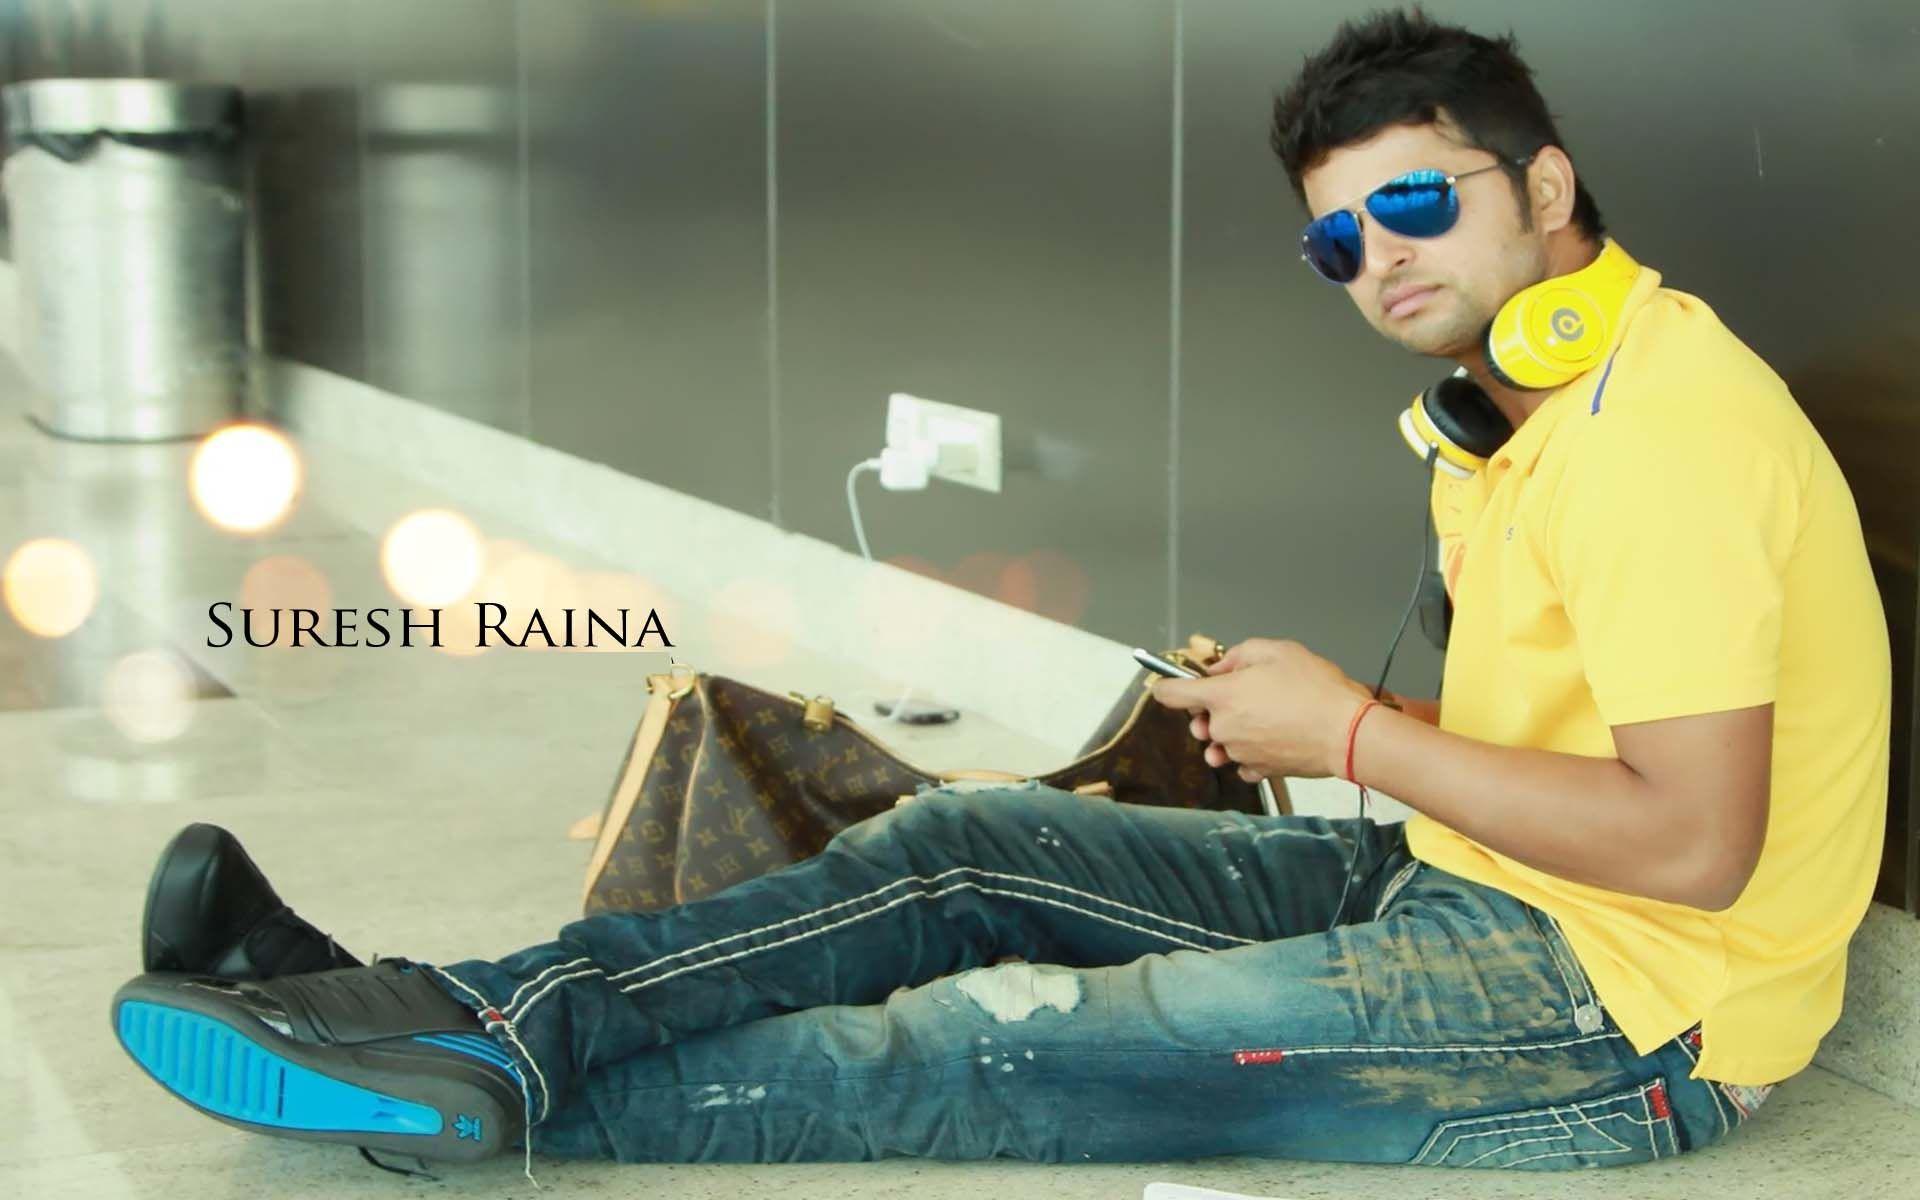 suresh raina indian cricketer hd wallpaper Indian